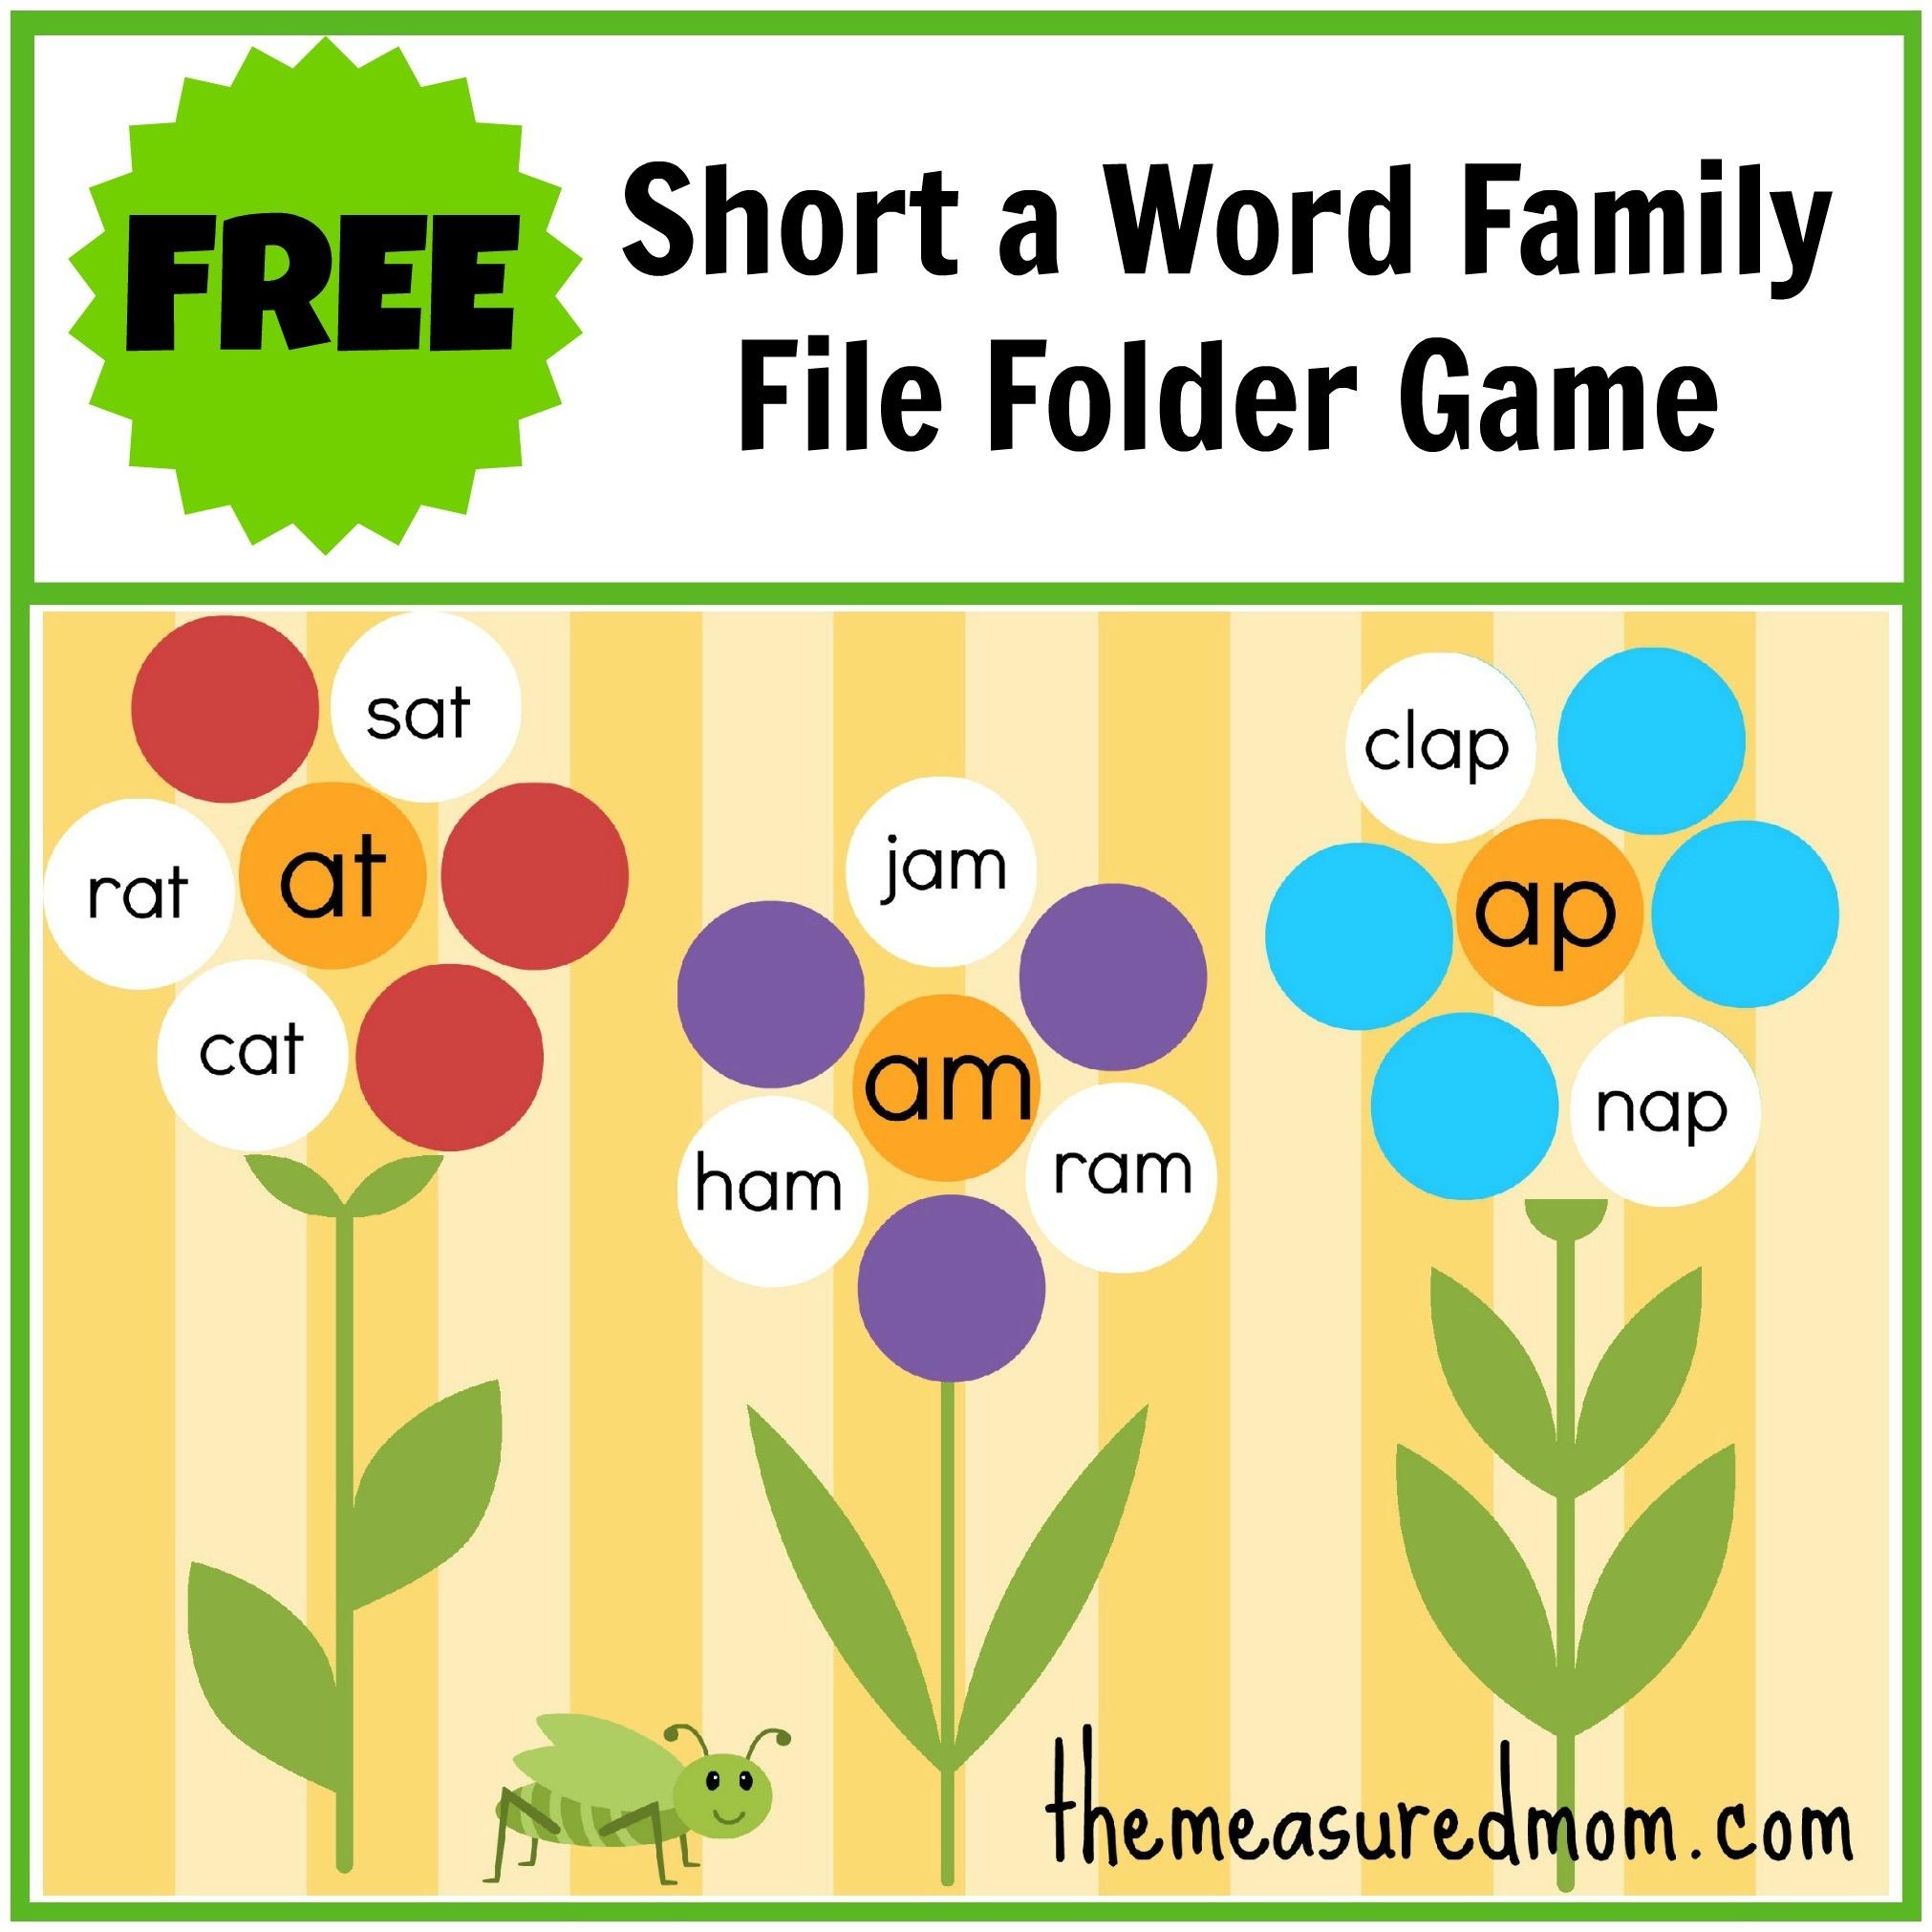 Free Word Family File Folder Game: Short A - The Measured Mom - Free Printable Folder Games